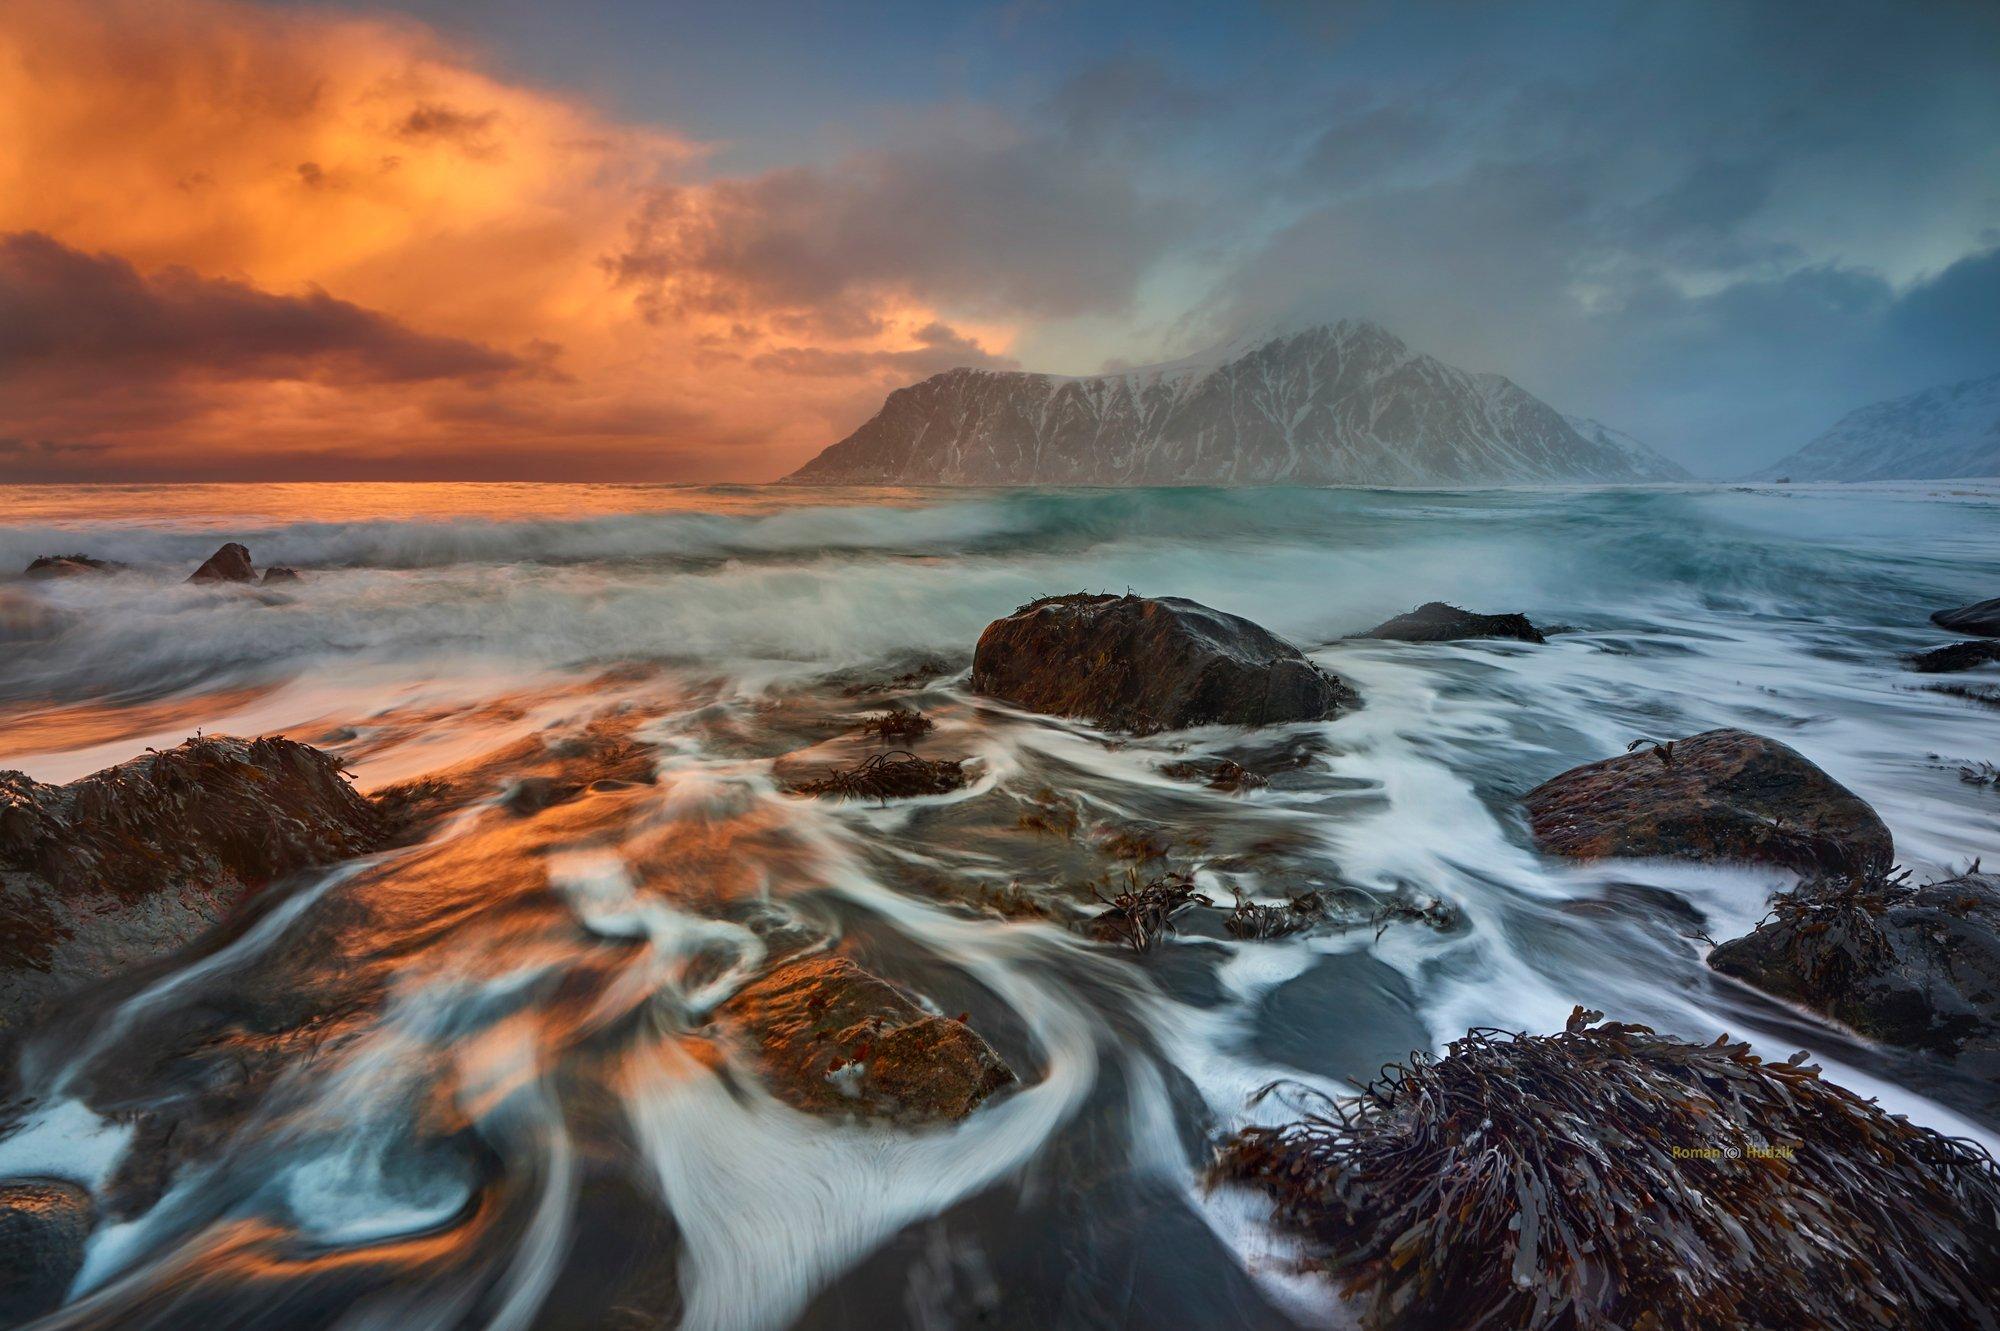 Lofoten, sunrise, Norway, sea, landscape, water, stones, clouds, beautiful views,, Hudzik Roman